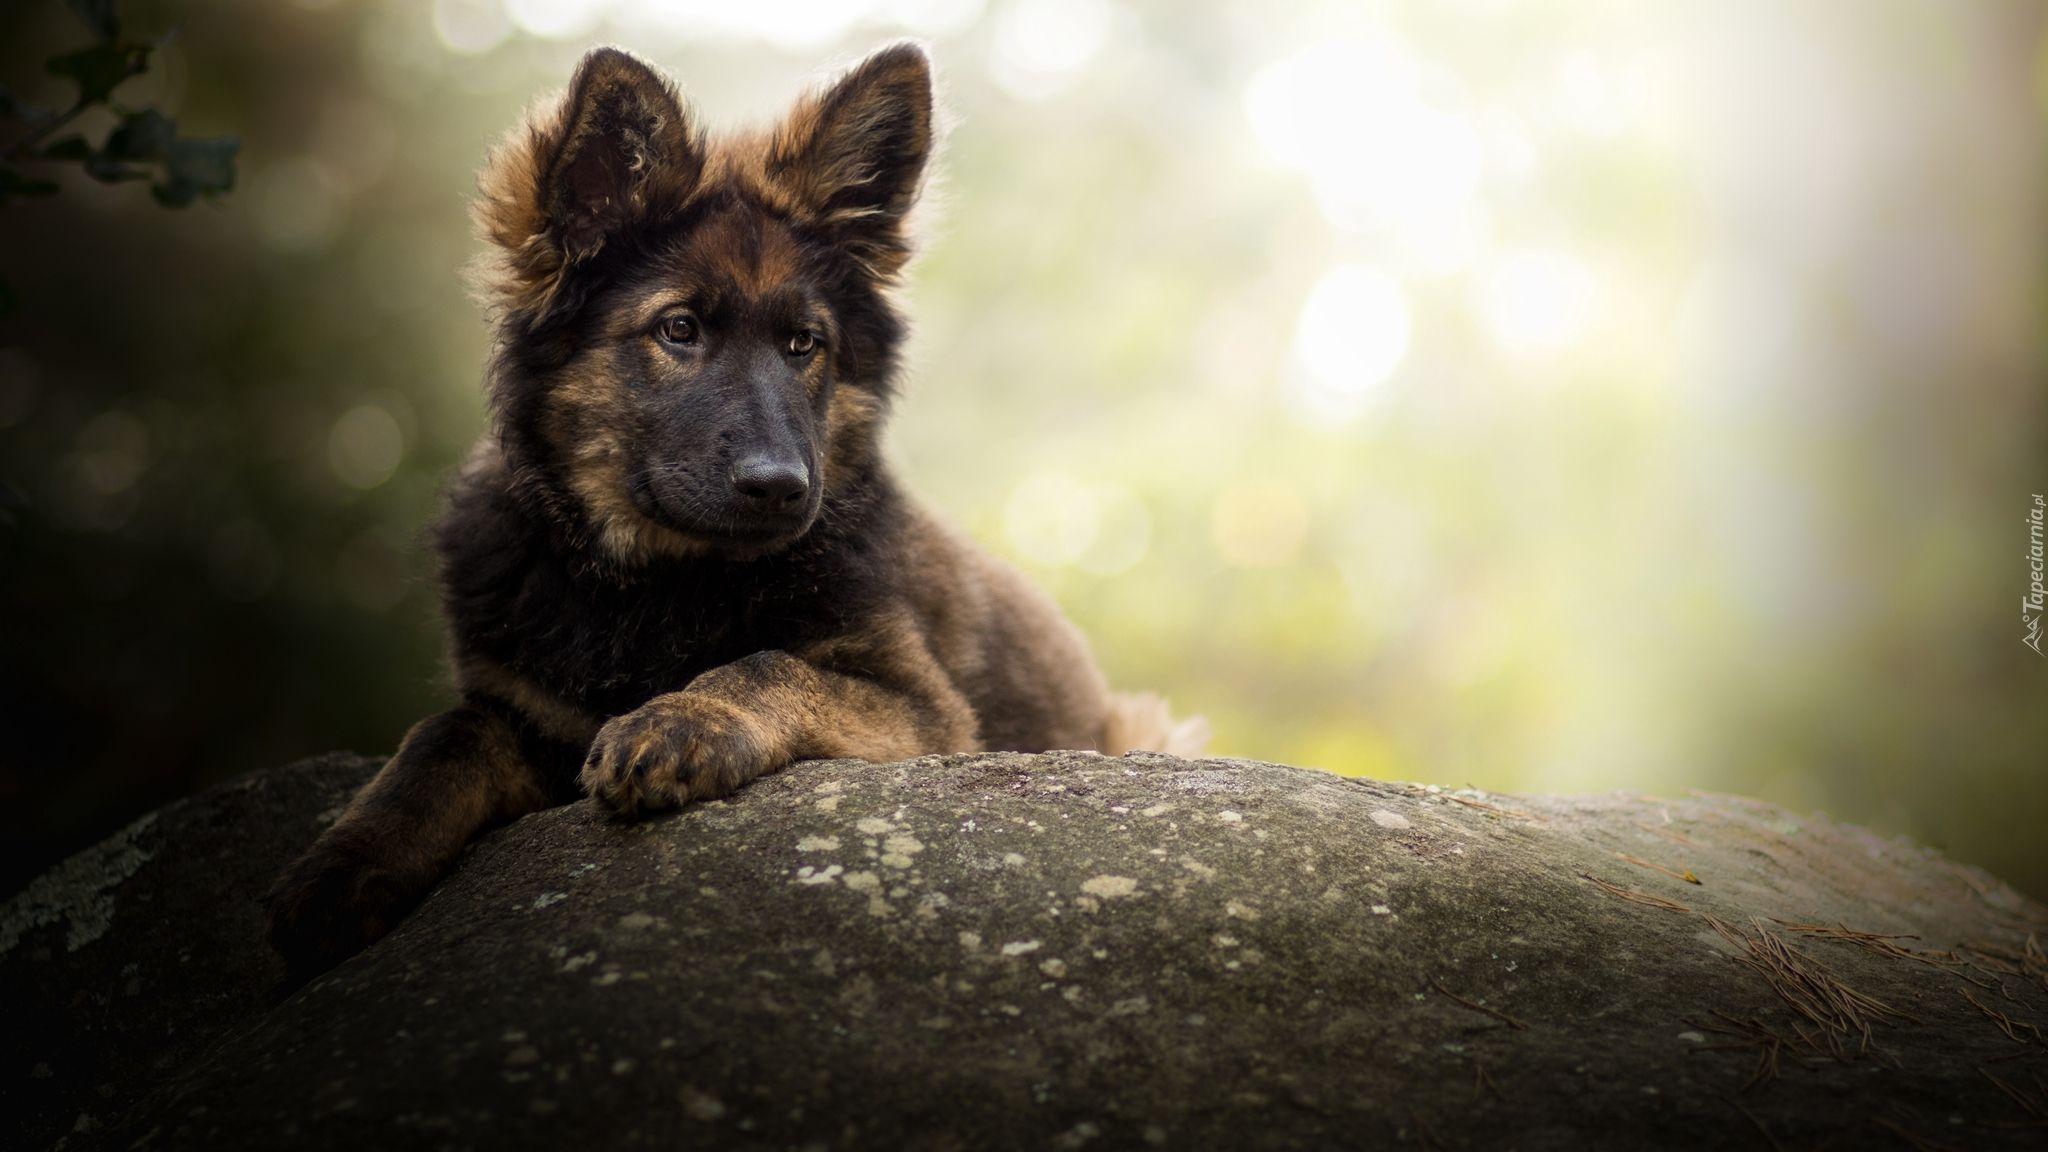 Owczarek niemiecki Owczarek niemiecki, Pies pasterski